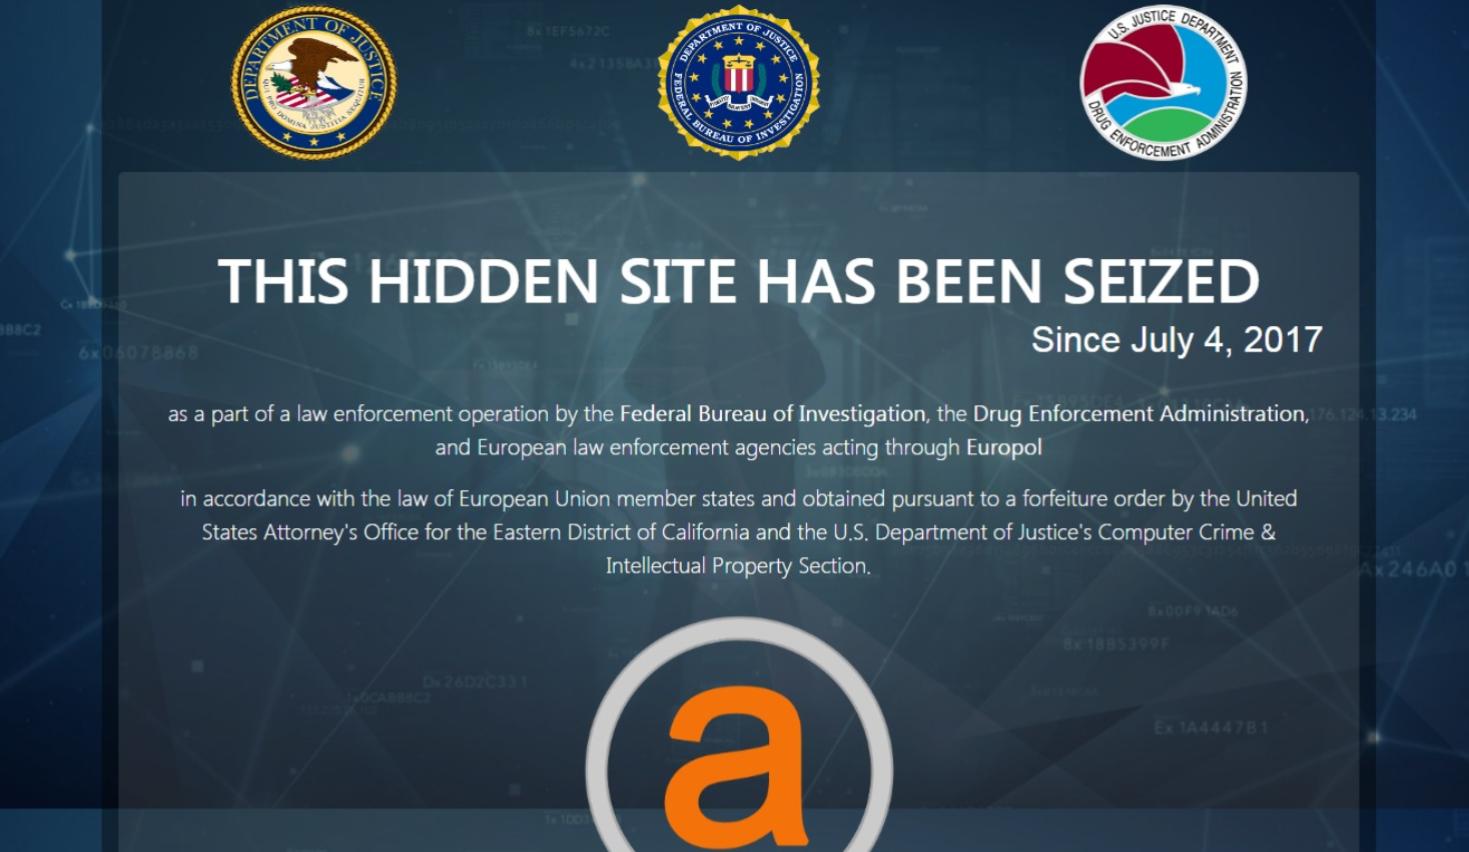 Hidden websites seized